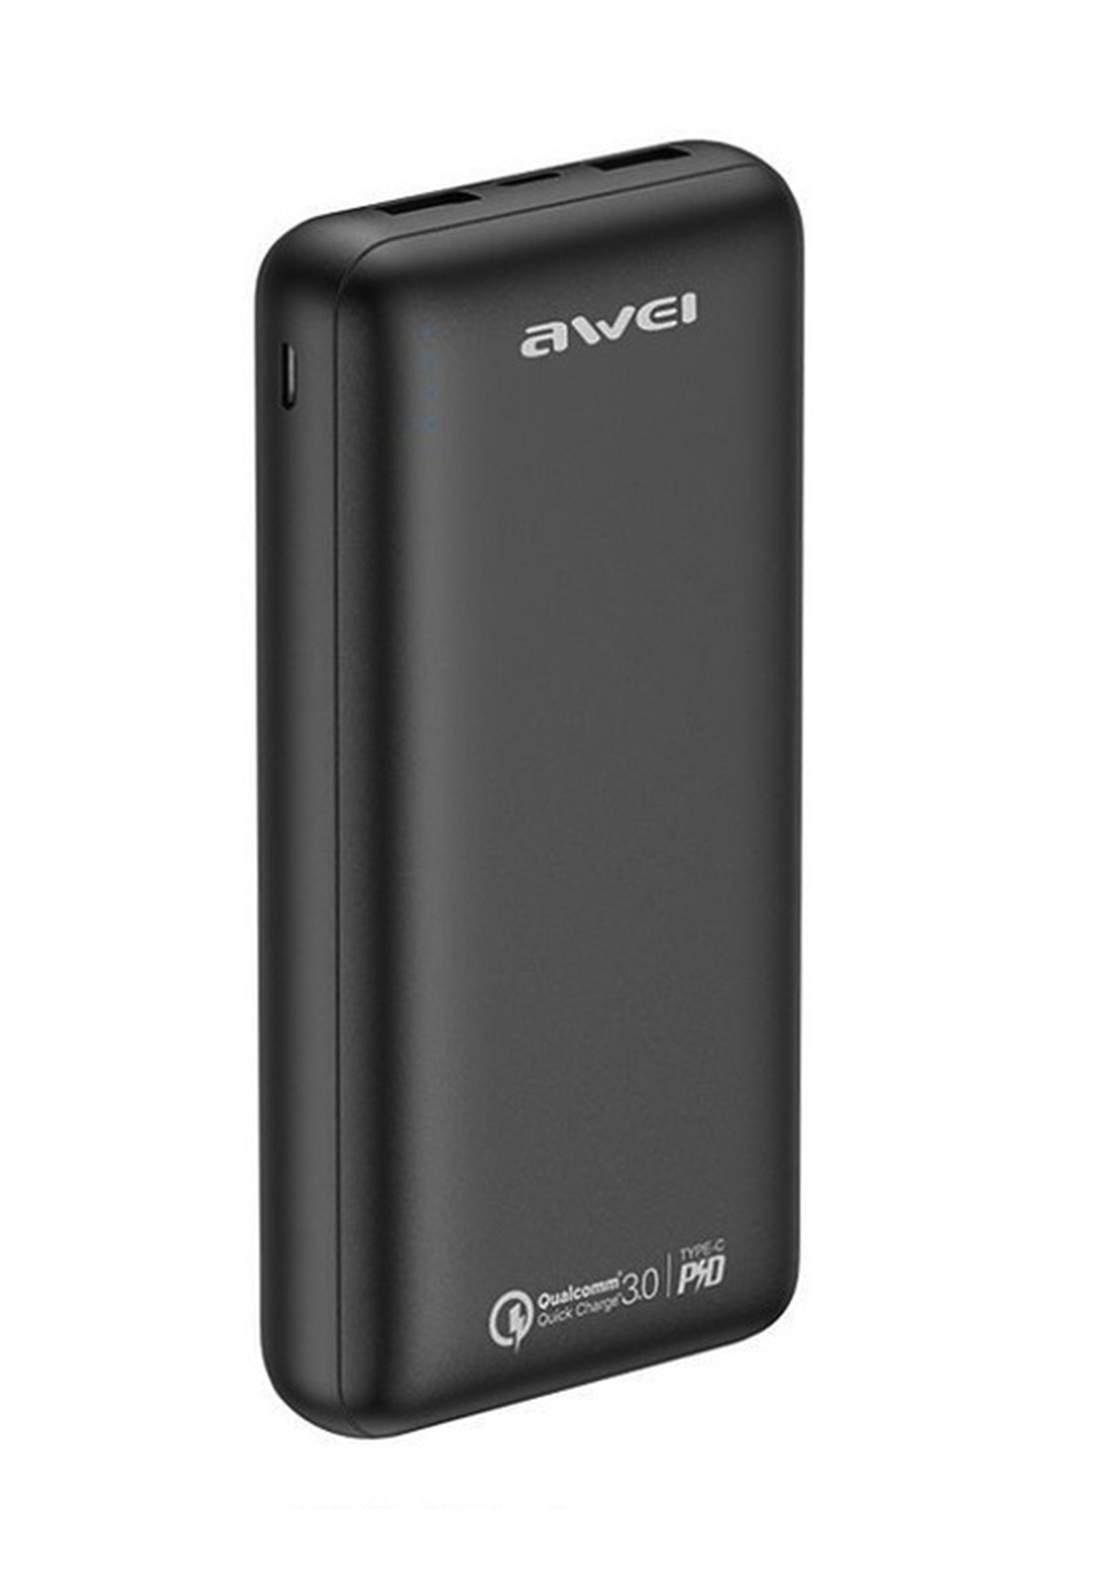 Awei P96K 20000mAh QC3.0 and PD3.0 Power Bank - Black شاحن محمول